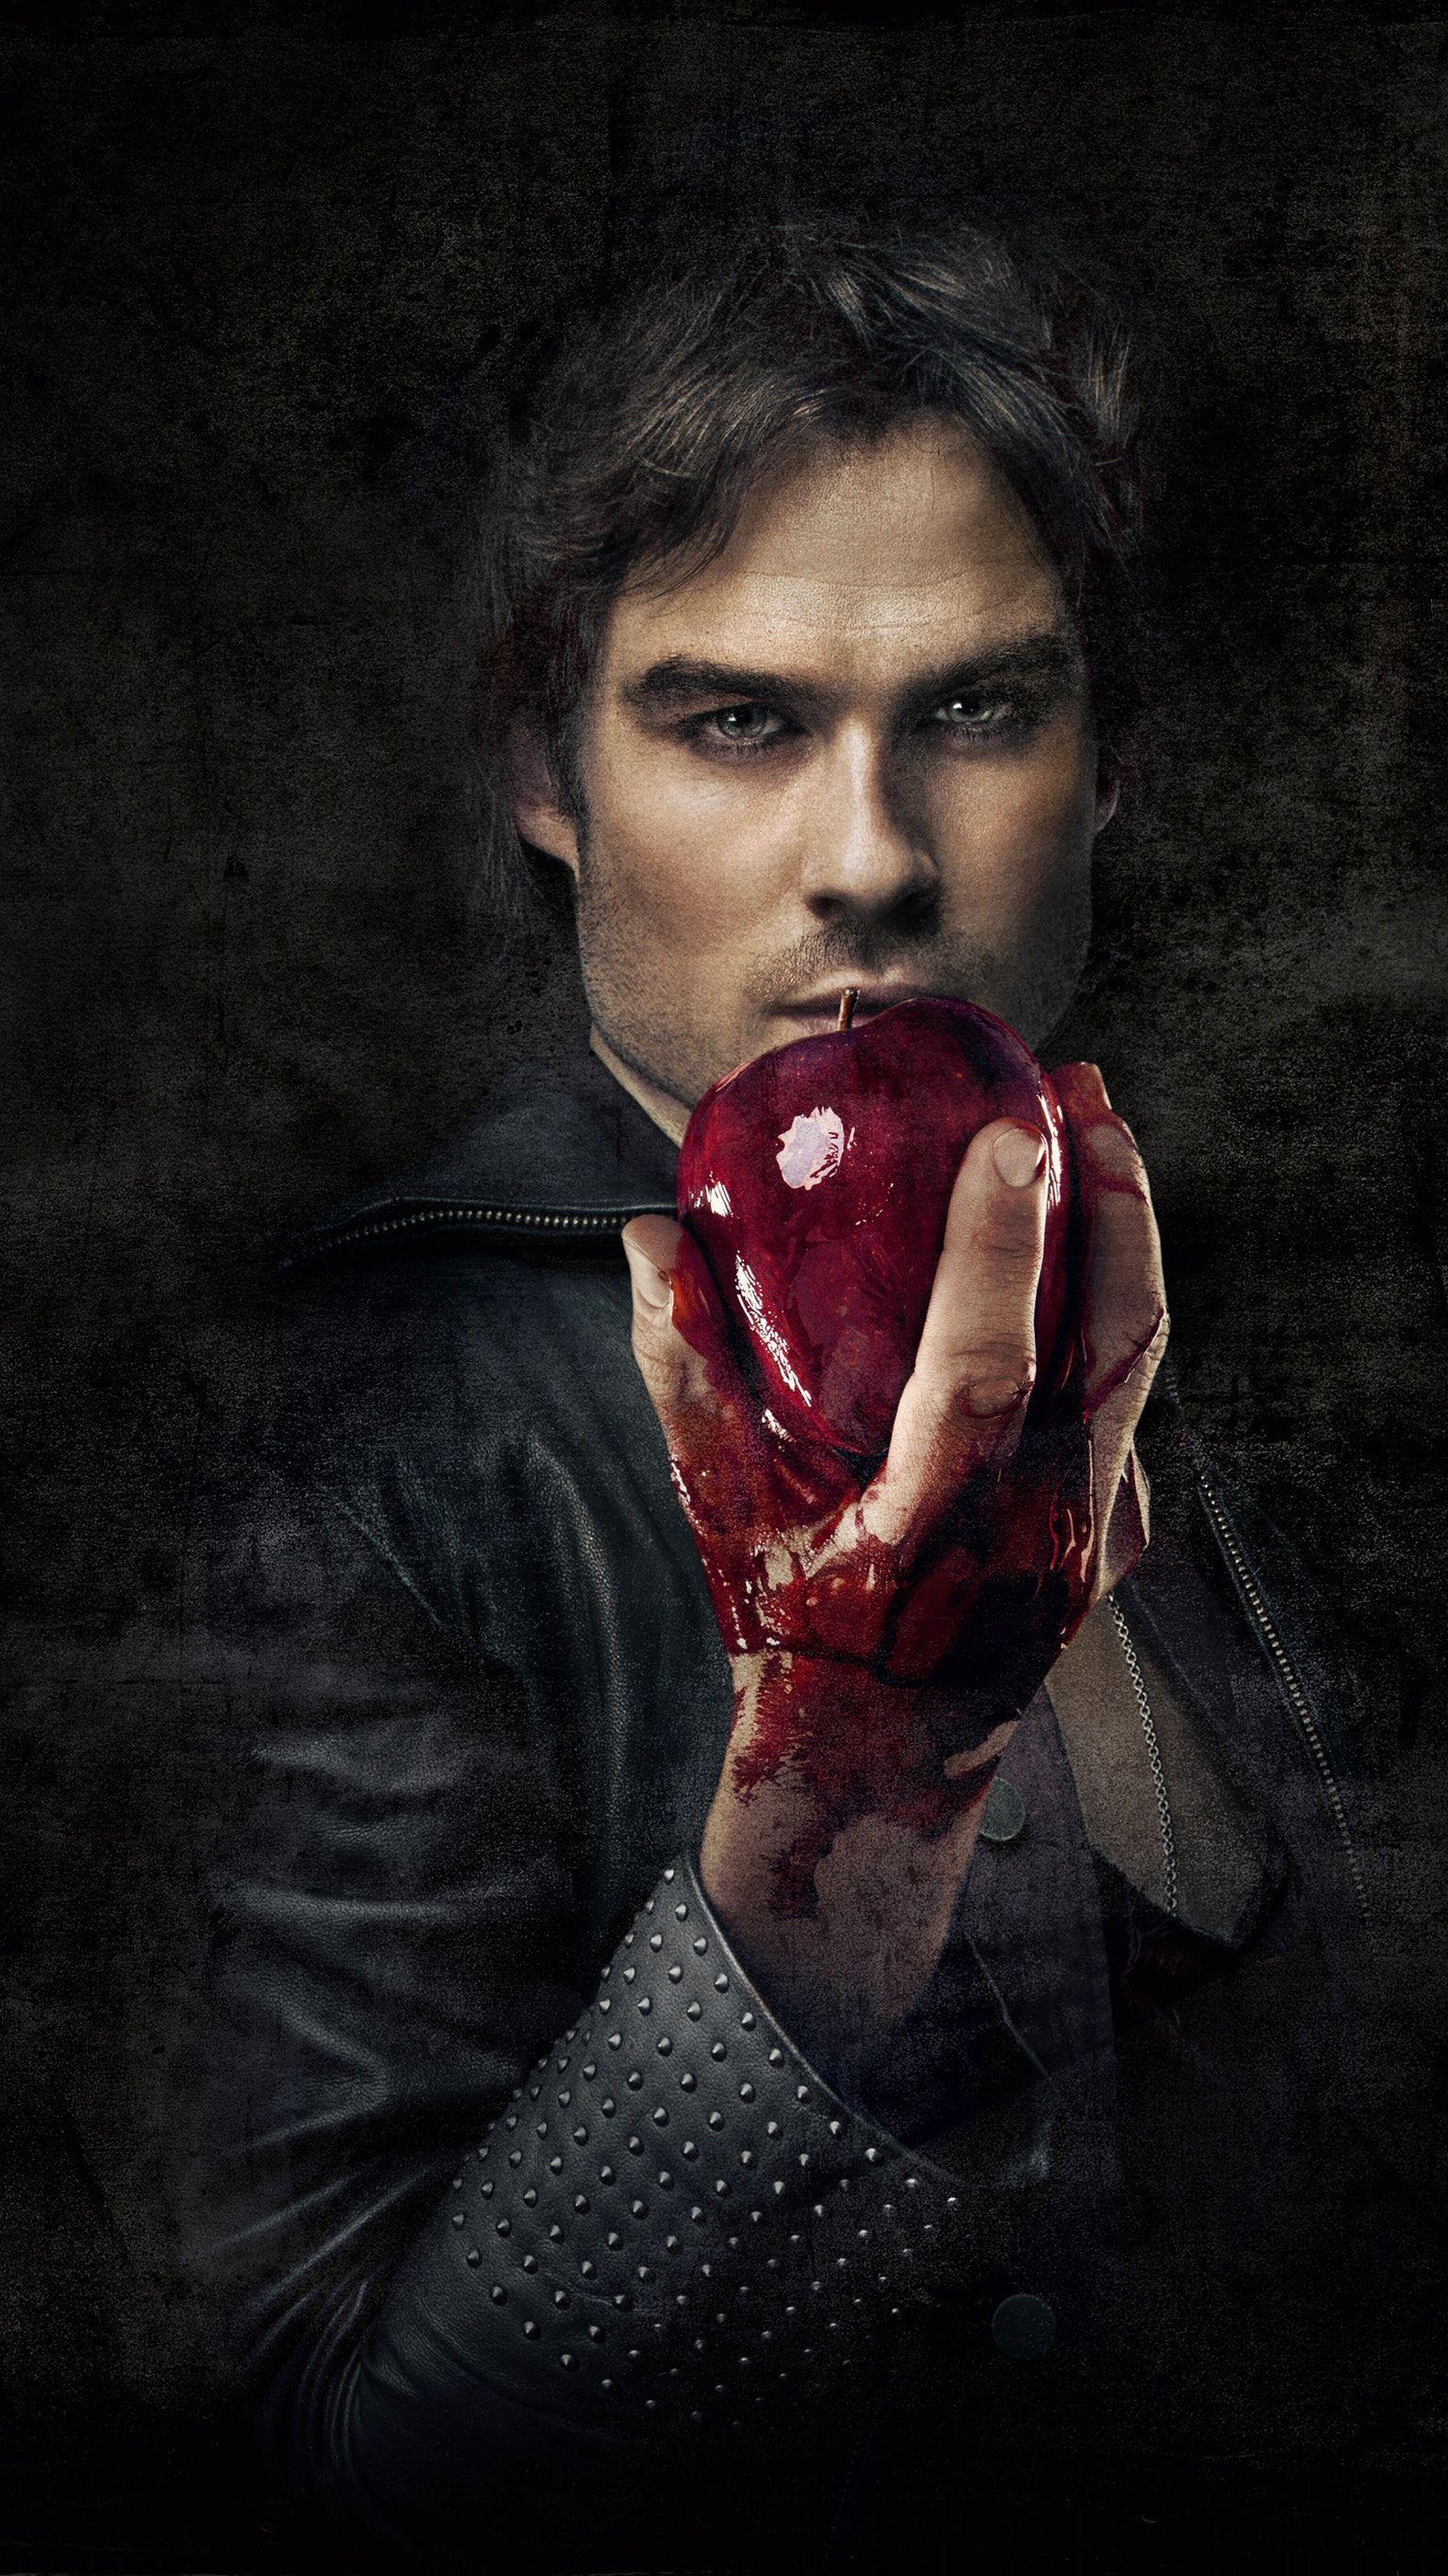 The Vampire Diaries Phone Wallpaper Ian Somerhalder Vampire